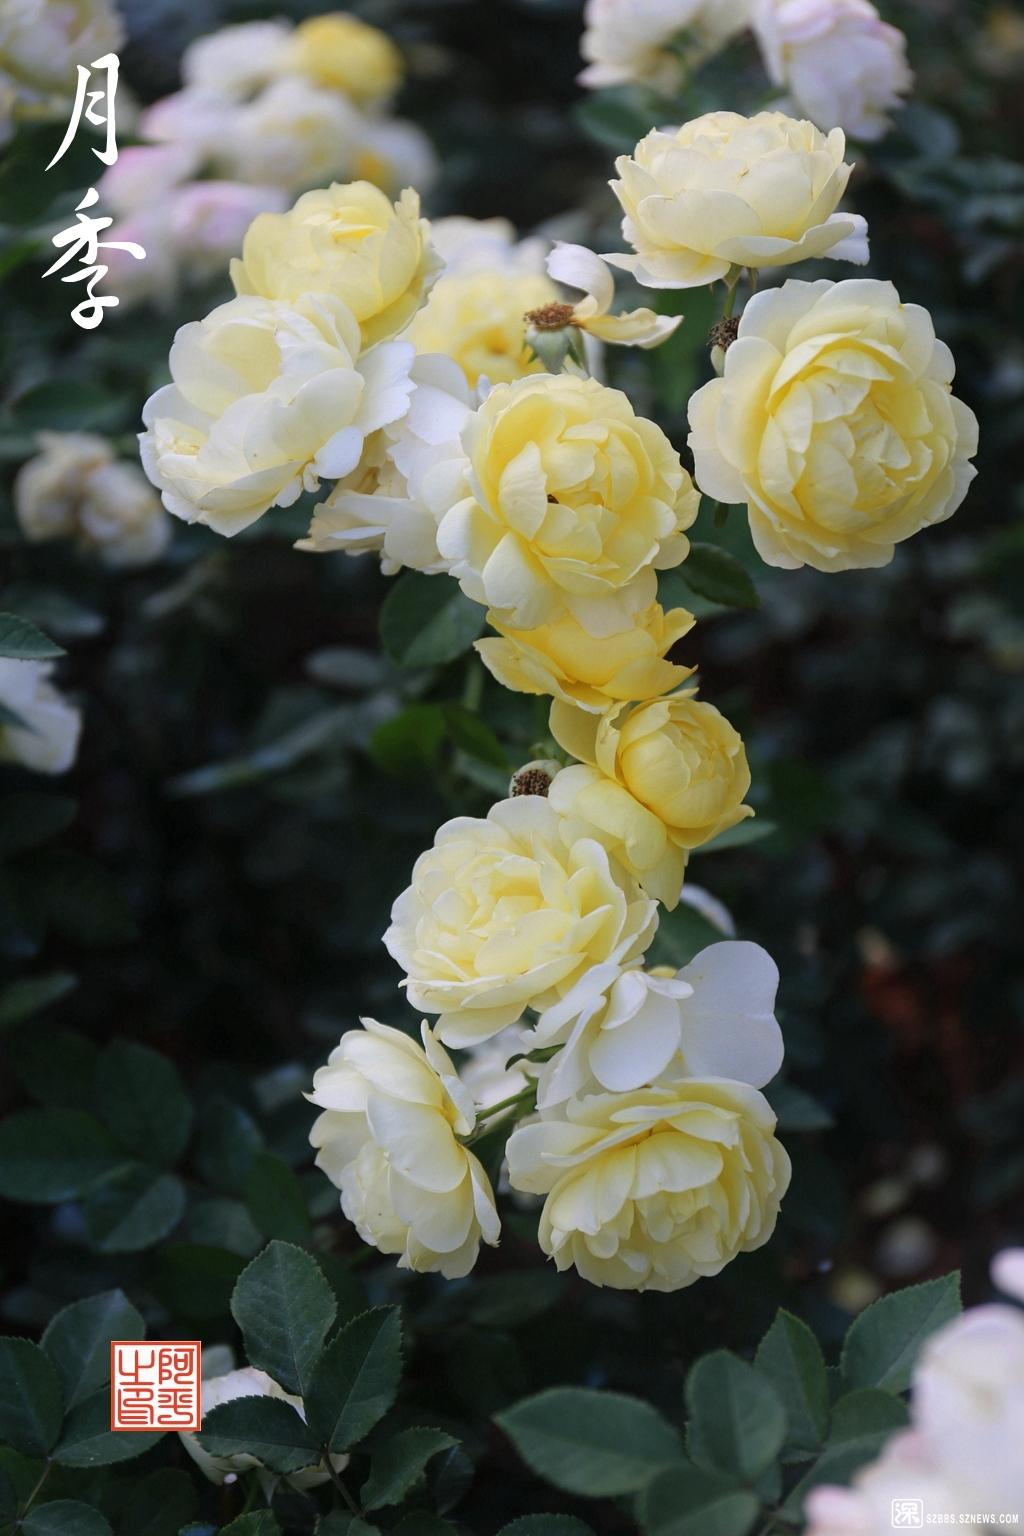 IMG_3409_副本.jpg